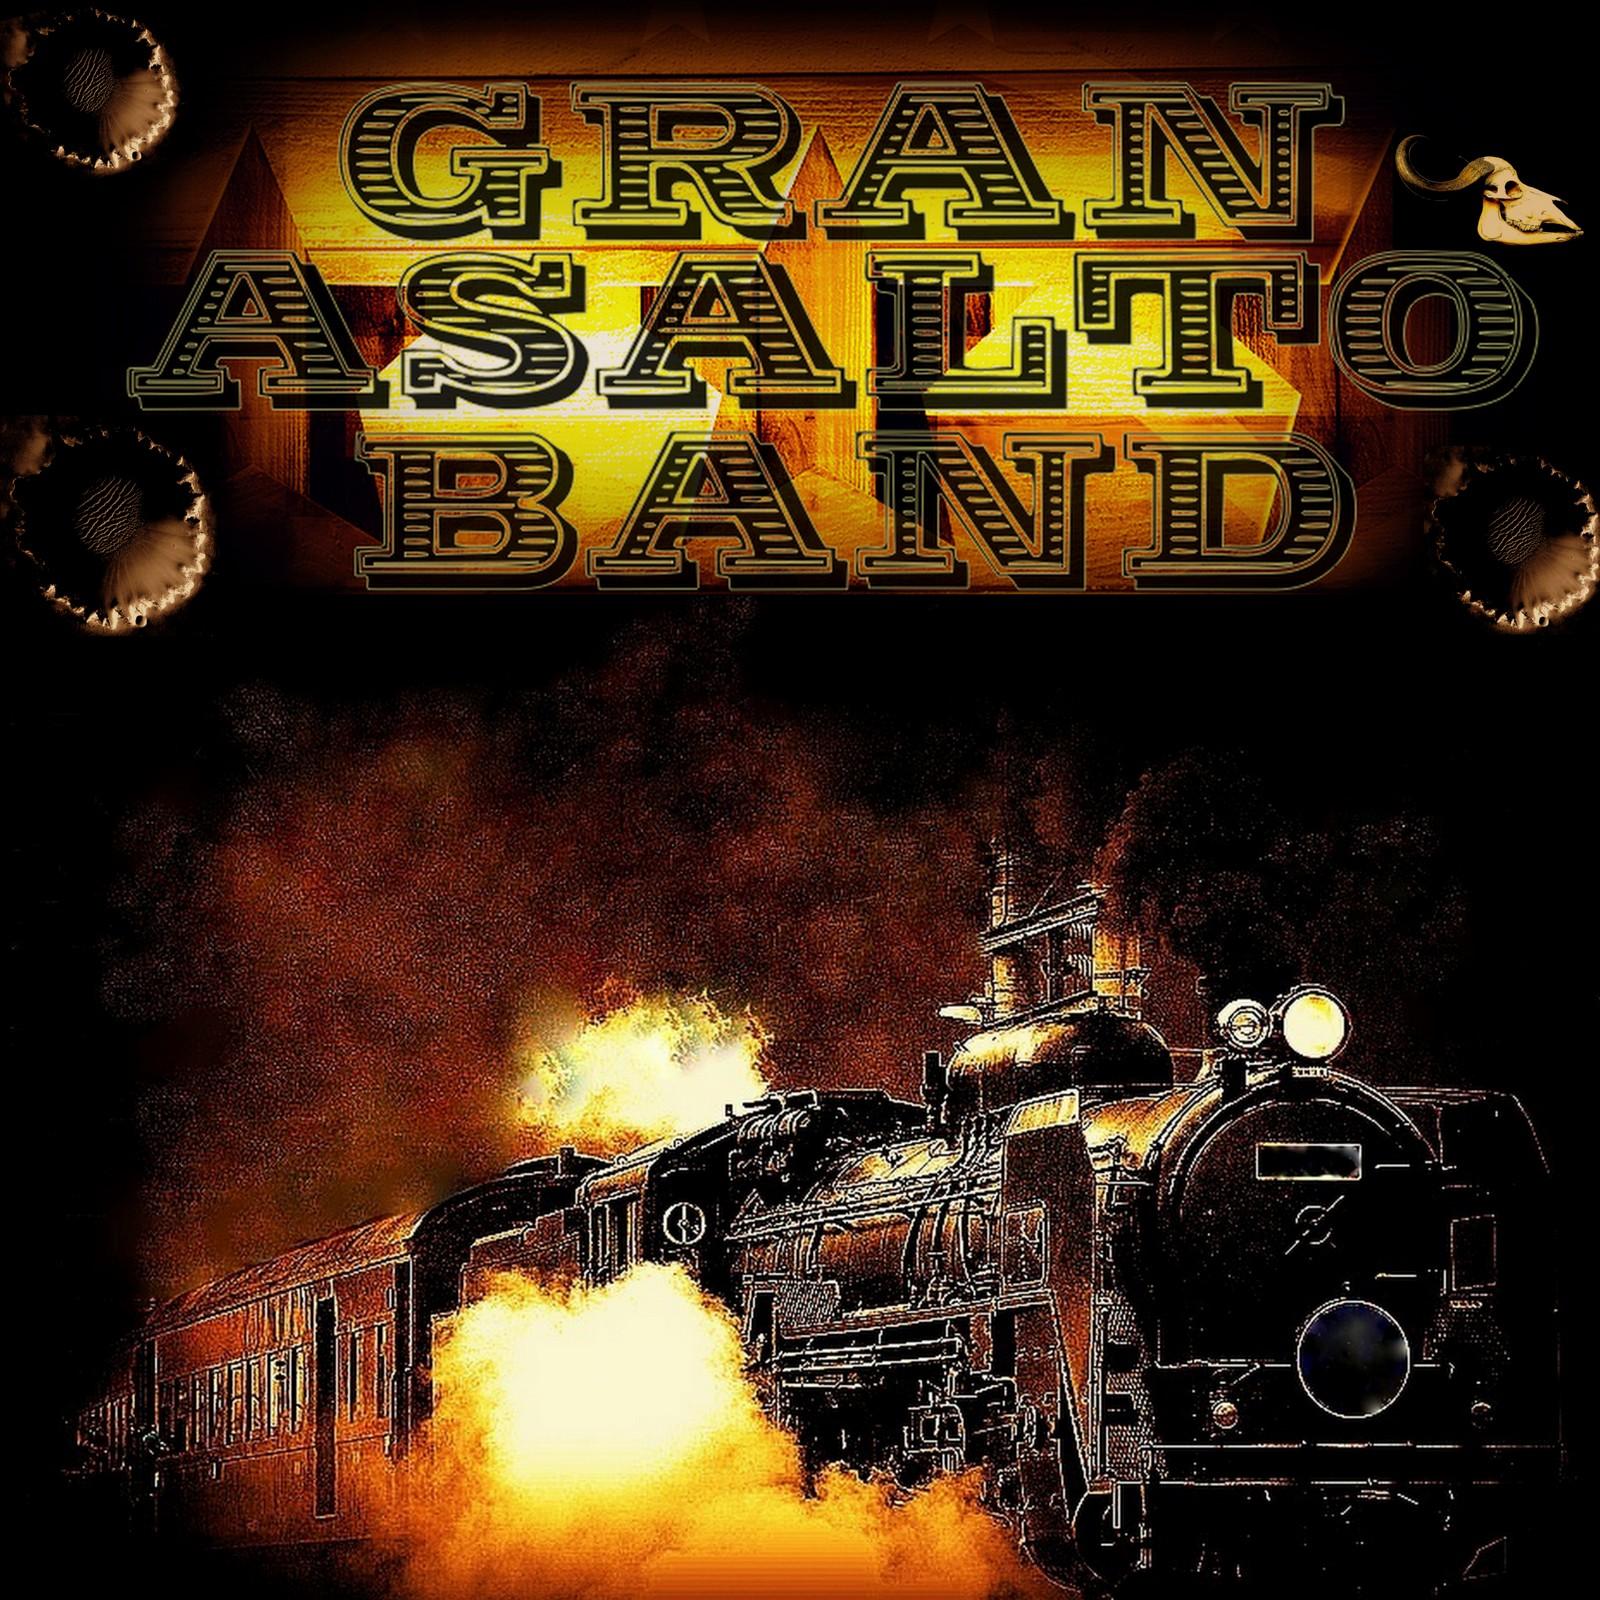 La Voz de Gran Asalto Band